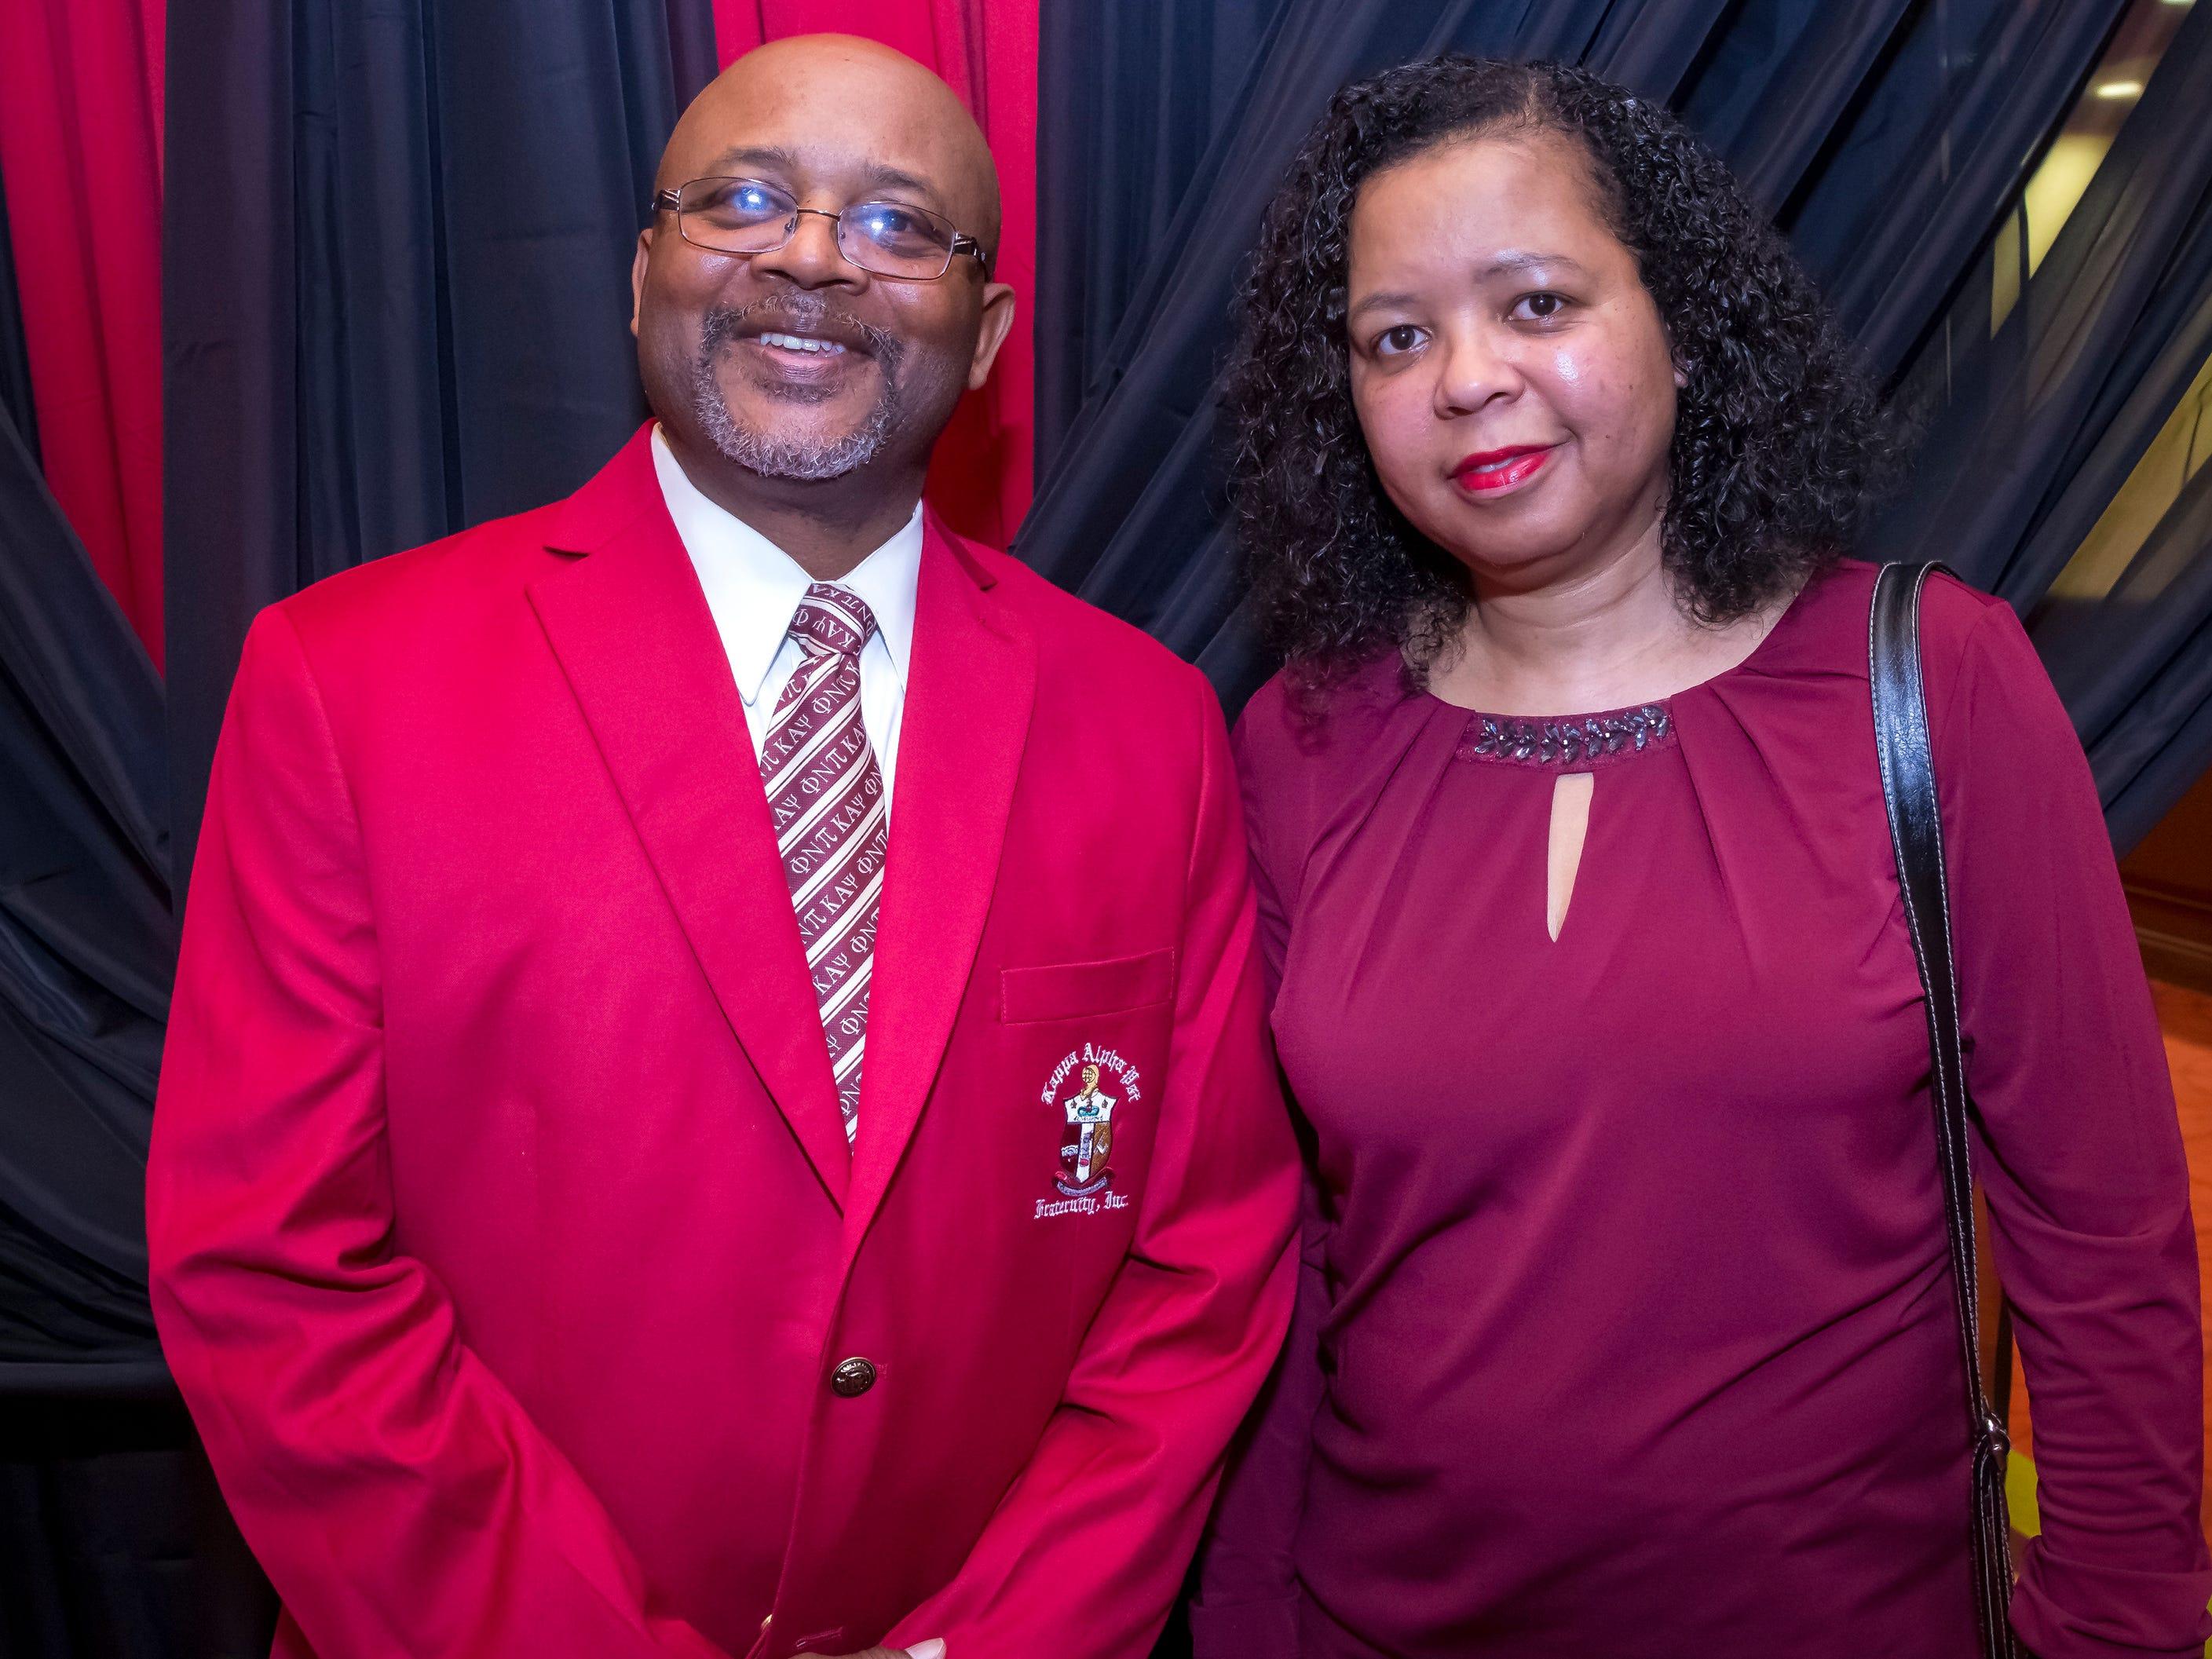 James and Marsha Robb at the Murfreesboro Alumni Chapter of Kappa Alpha Psi Fraternity Beautillion held at Embassy Suites.